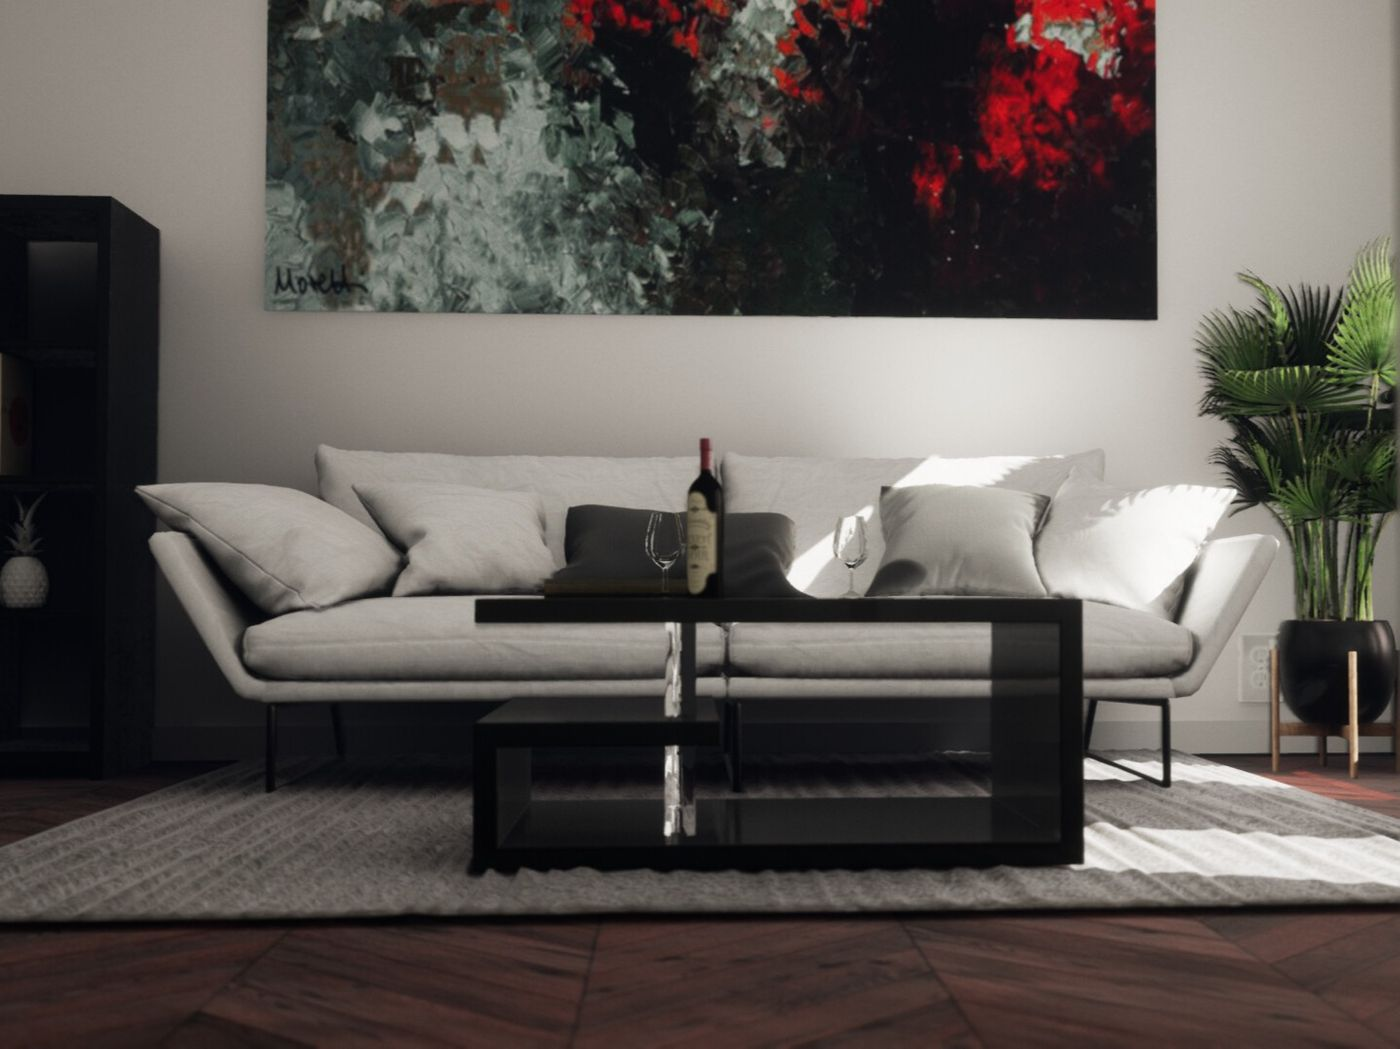 Lounge Interior - Unreal Engine 4 ArchViz Realtime | The Rookies